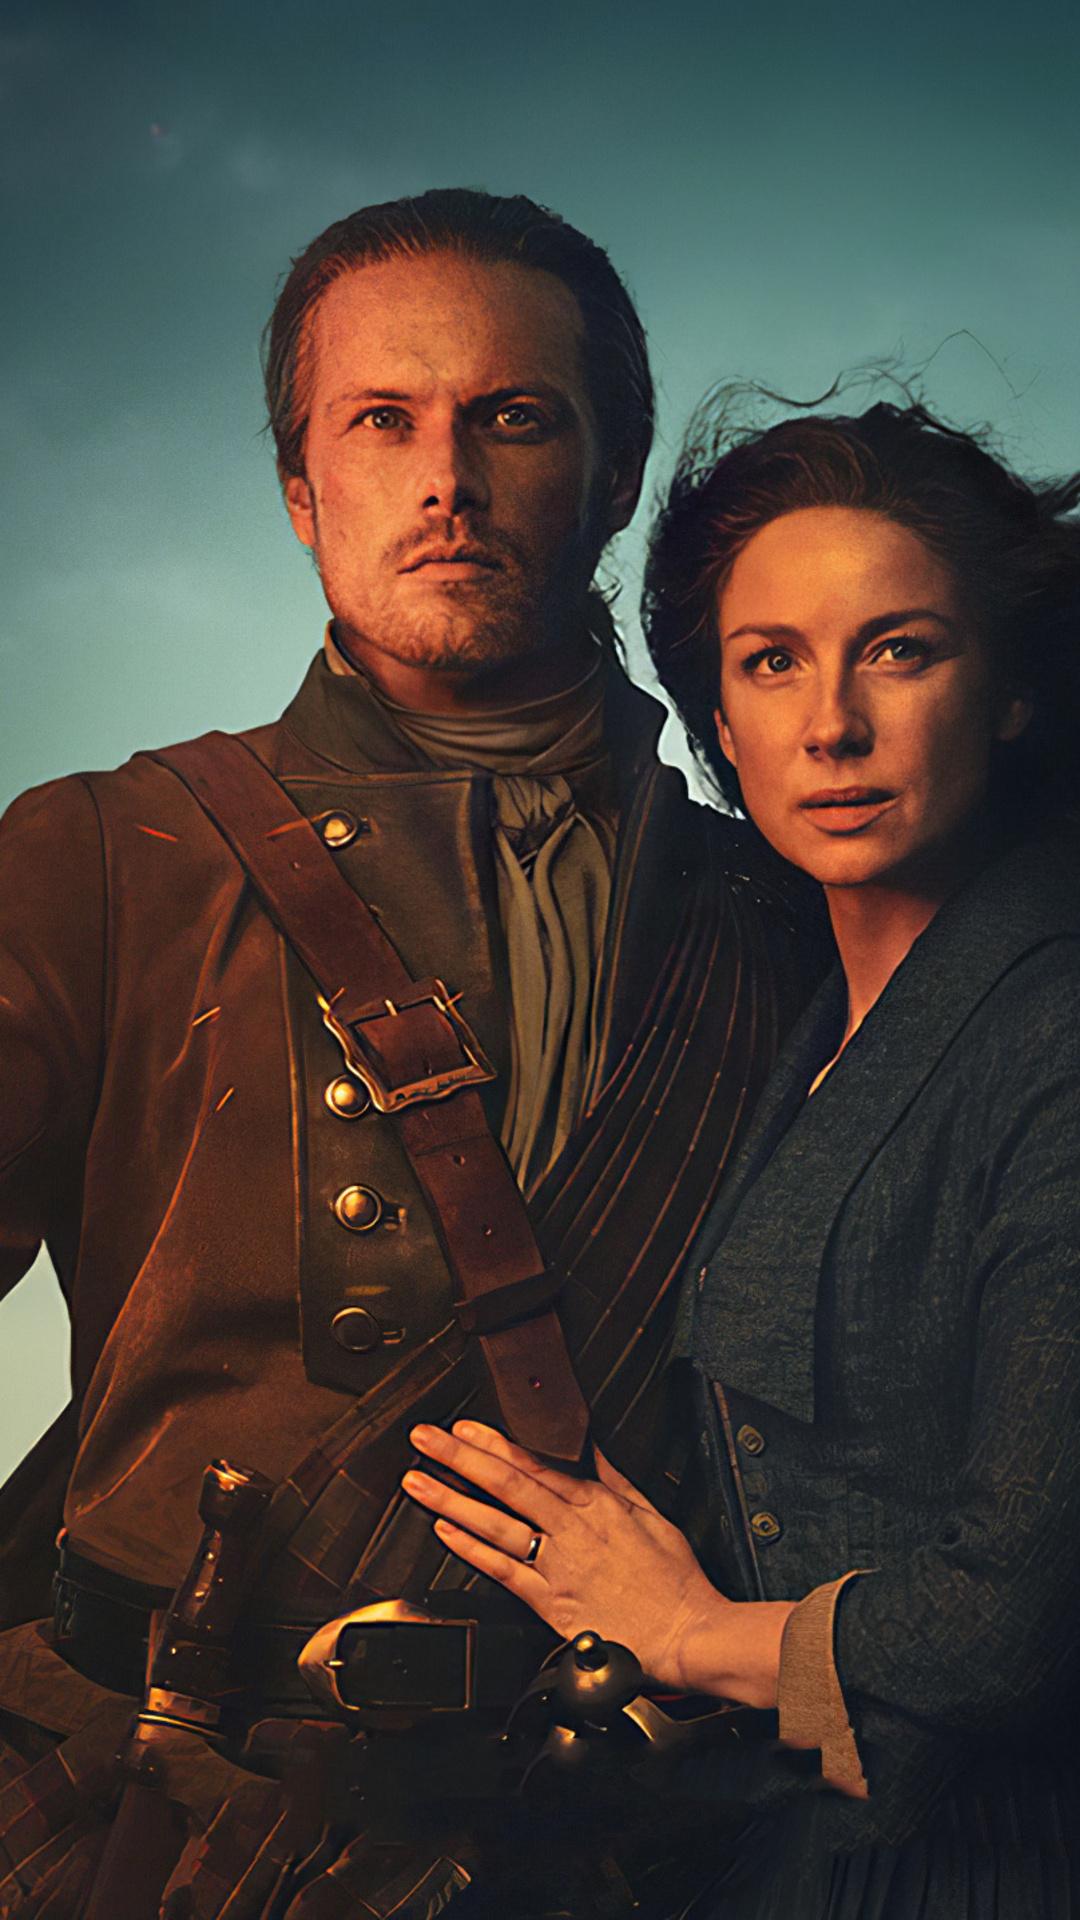 outlander-amazon-tv-series-w2.jpg